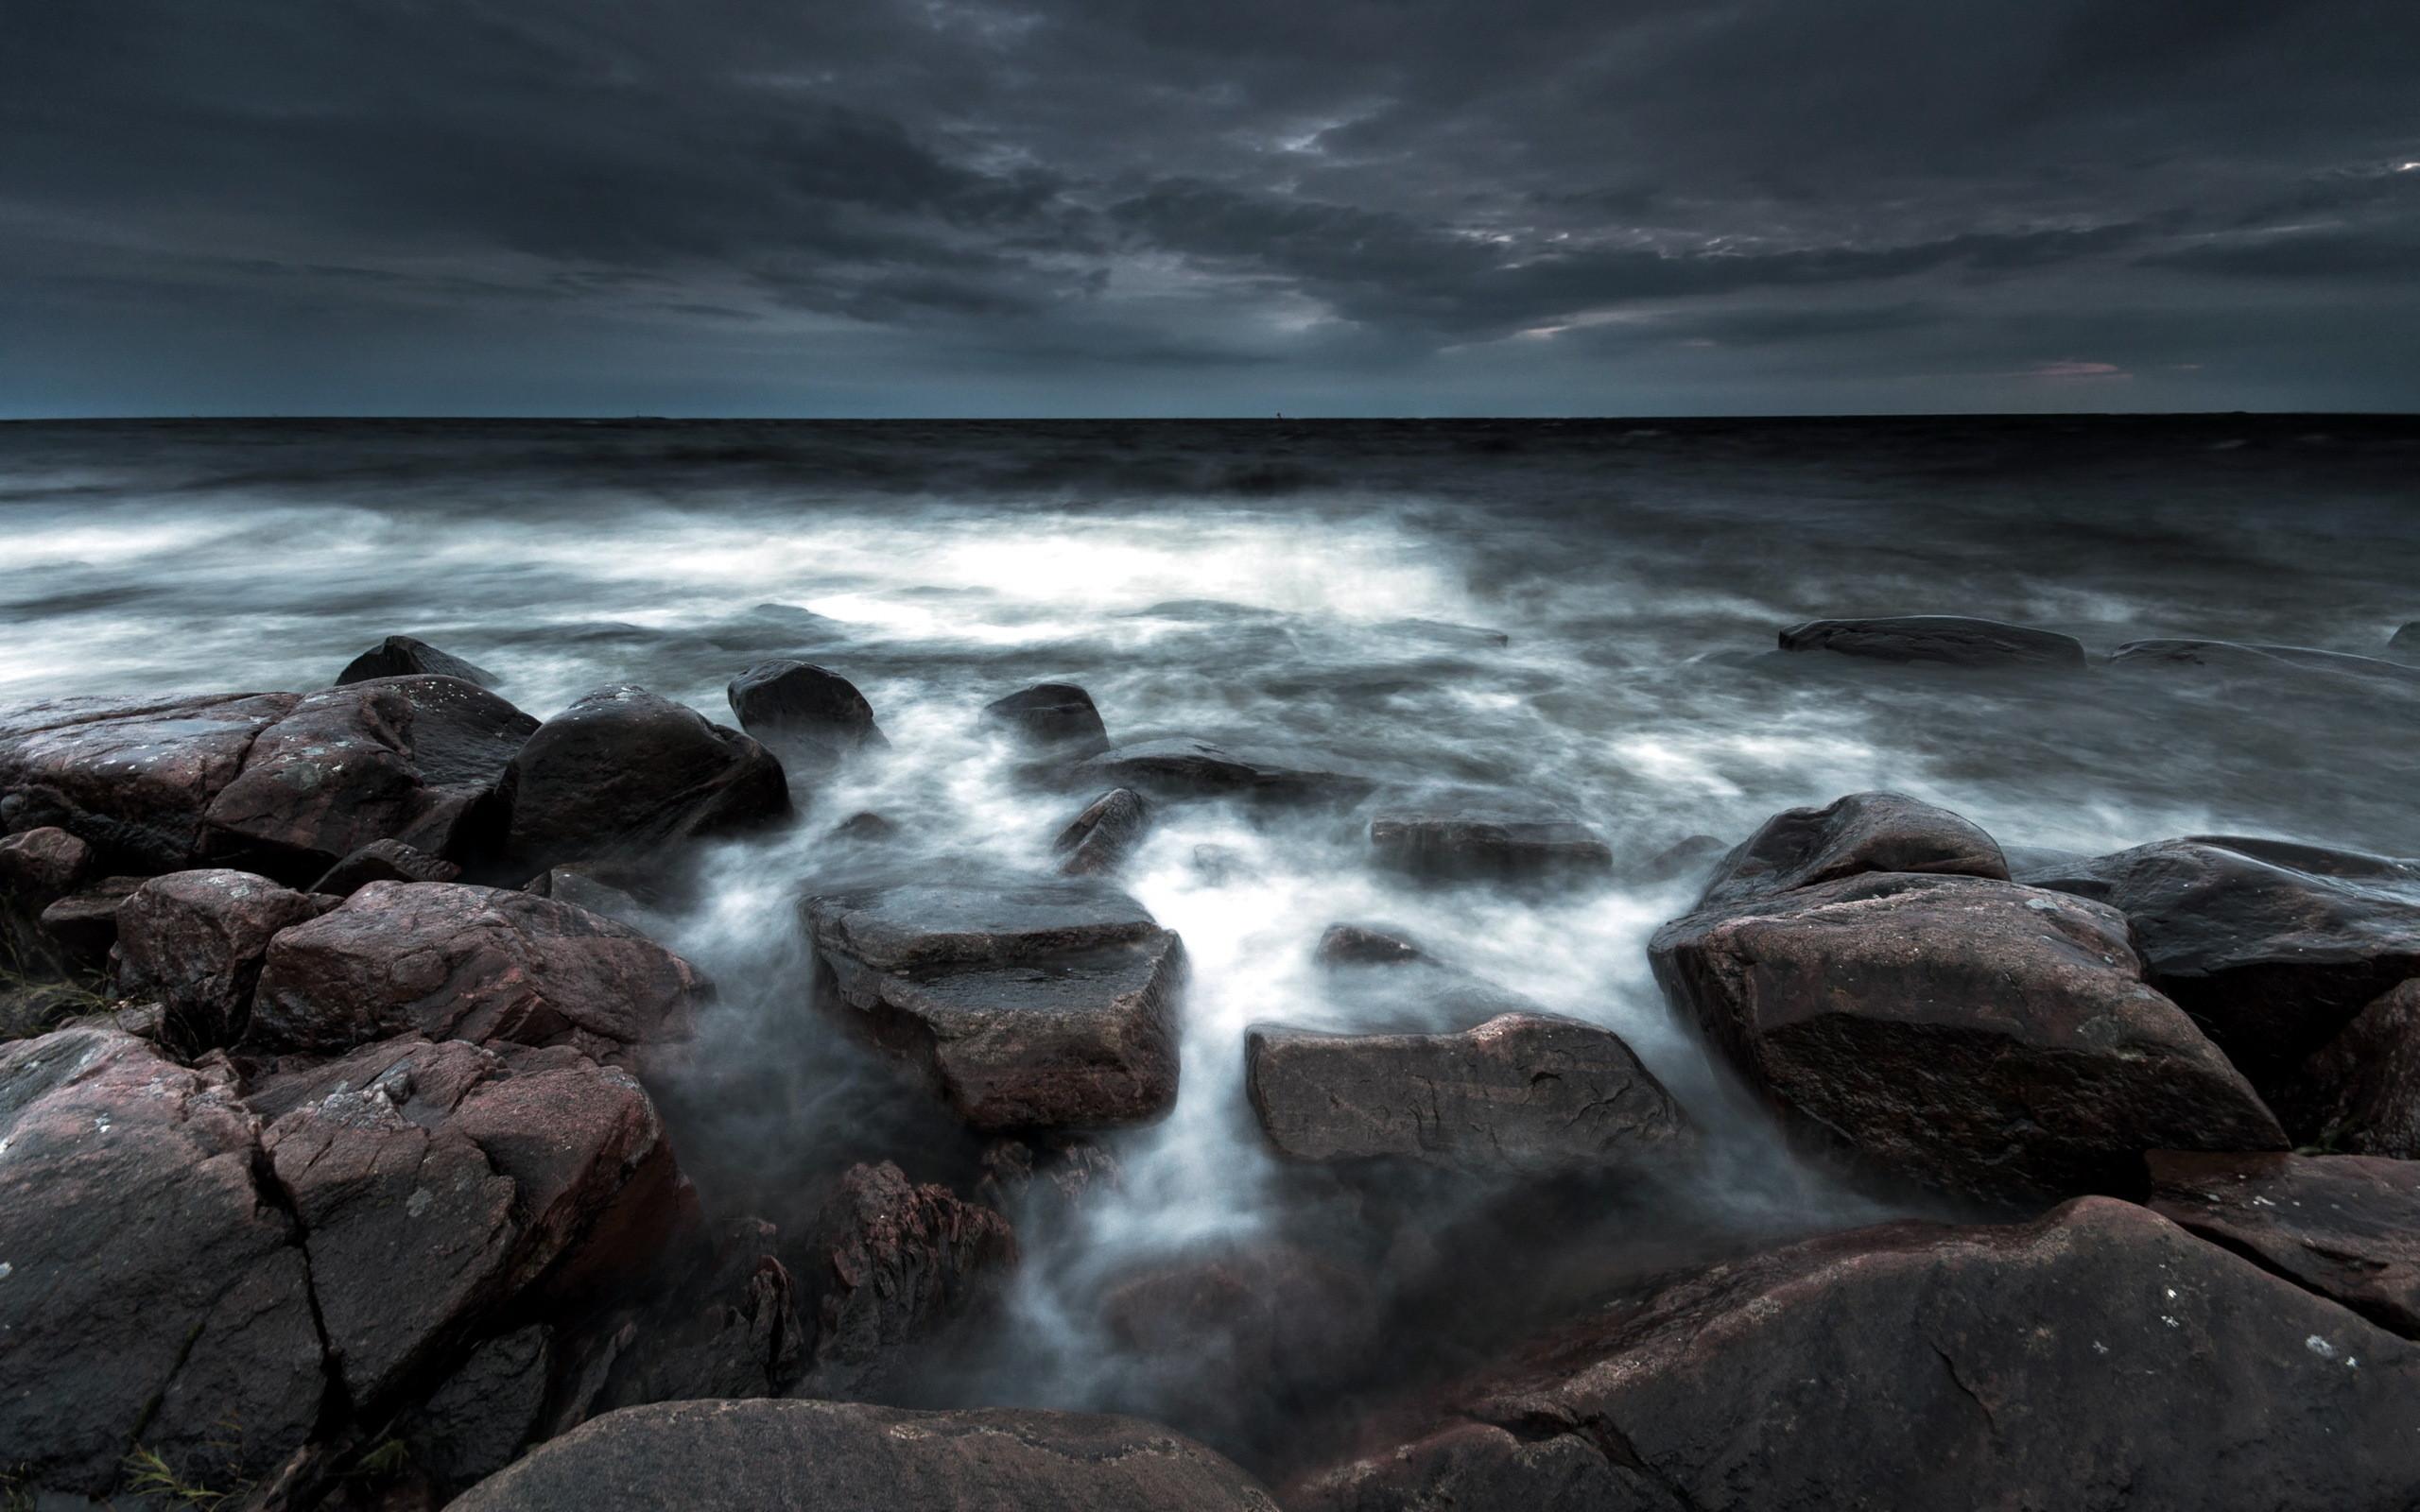 Sea aeYaeY night rocks landscape beaches ocean sky wallpaper      46777   WallpaperUP